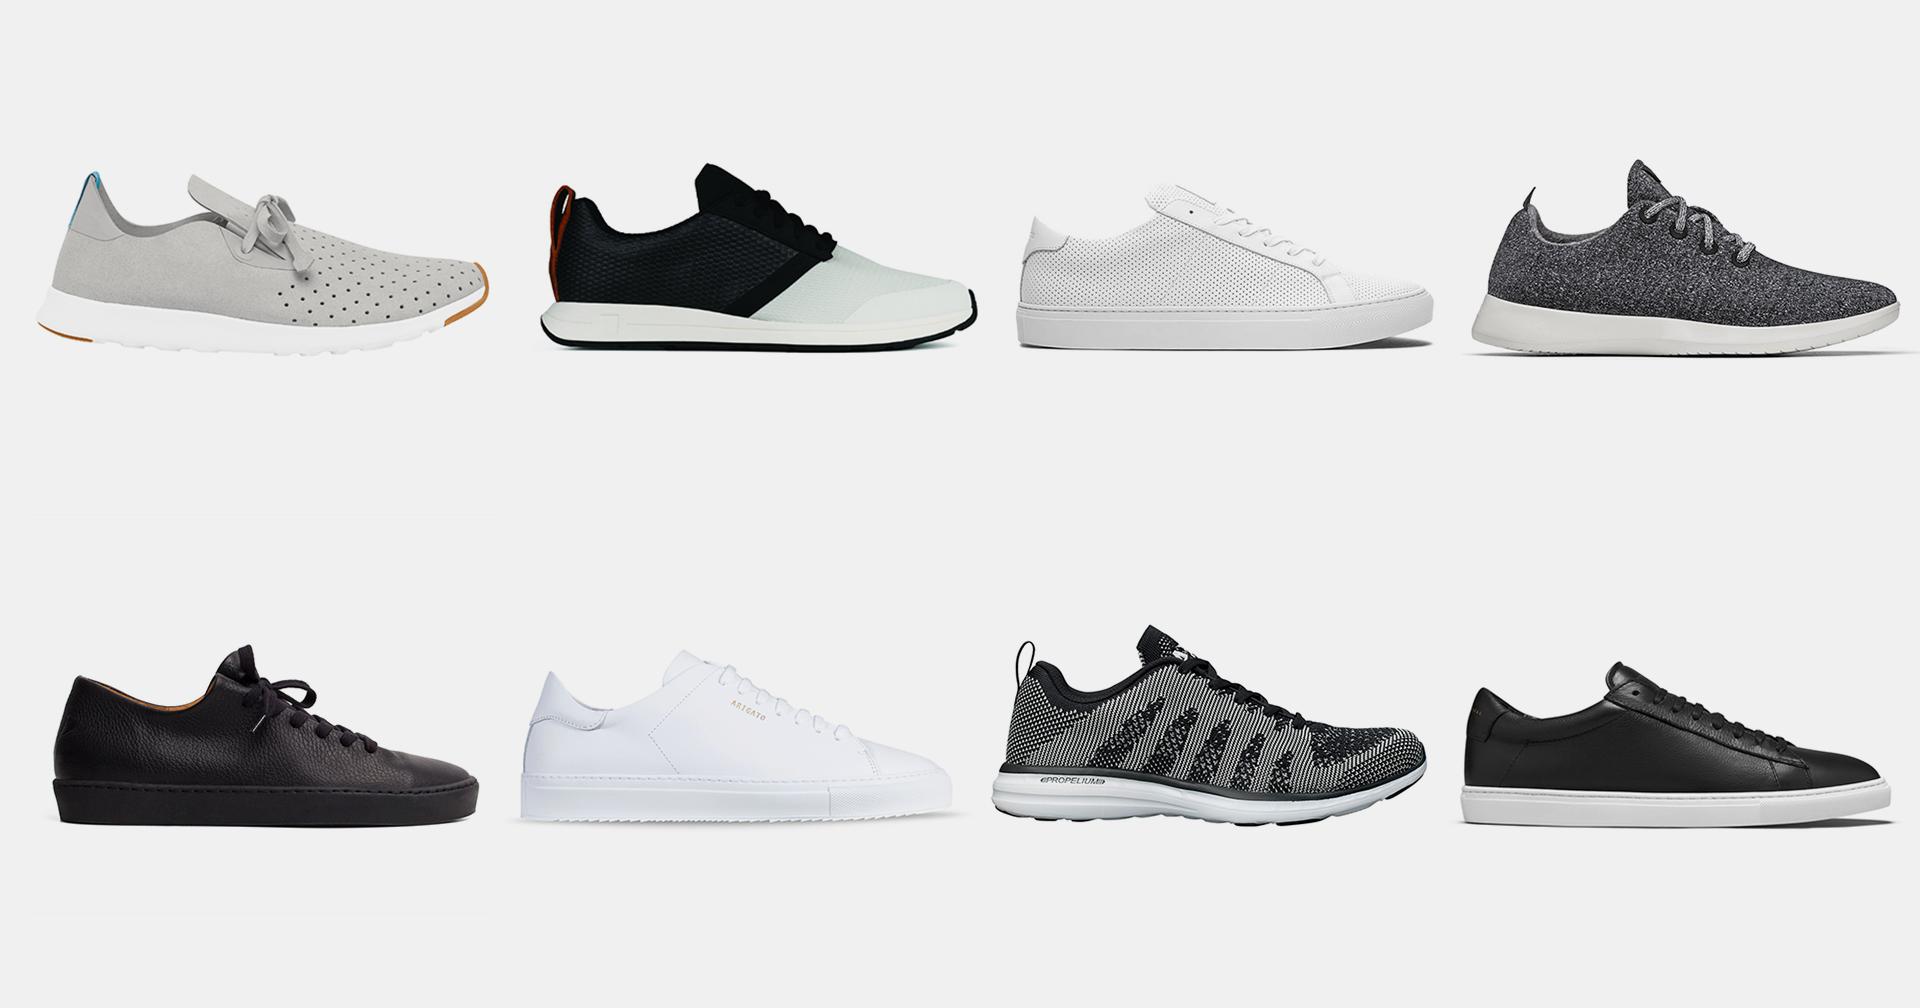 Sneaker Brands Every Guy Should